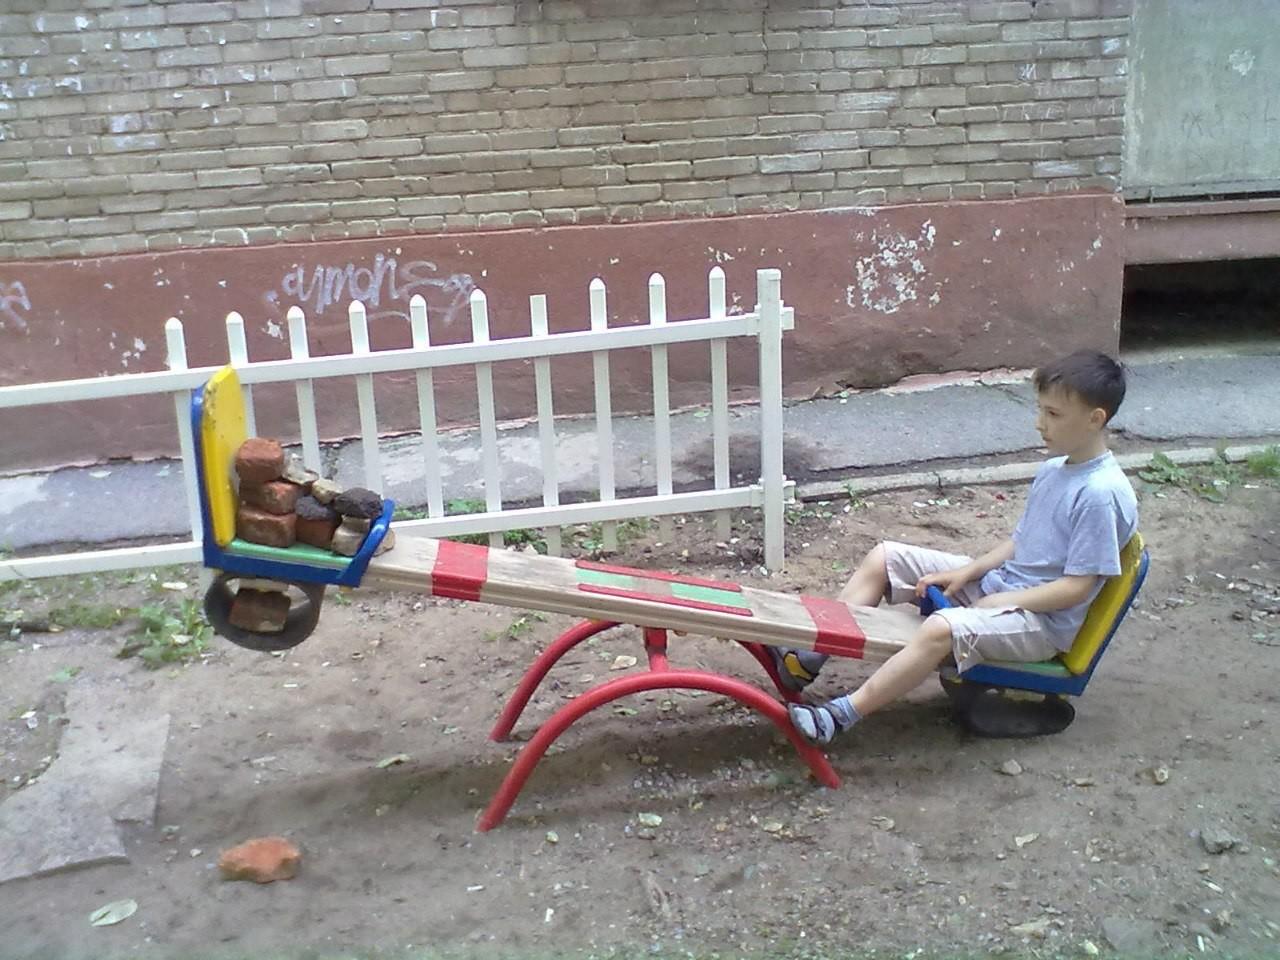 Про одиночество на азарбайчански 2 фотография